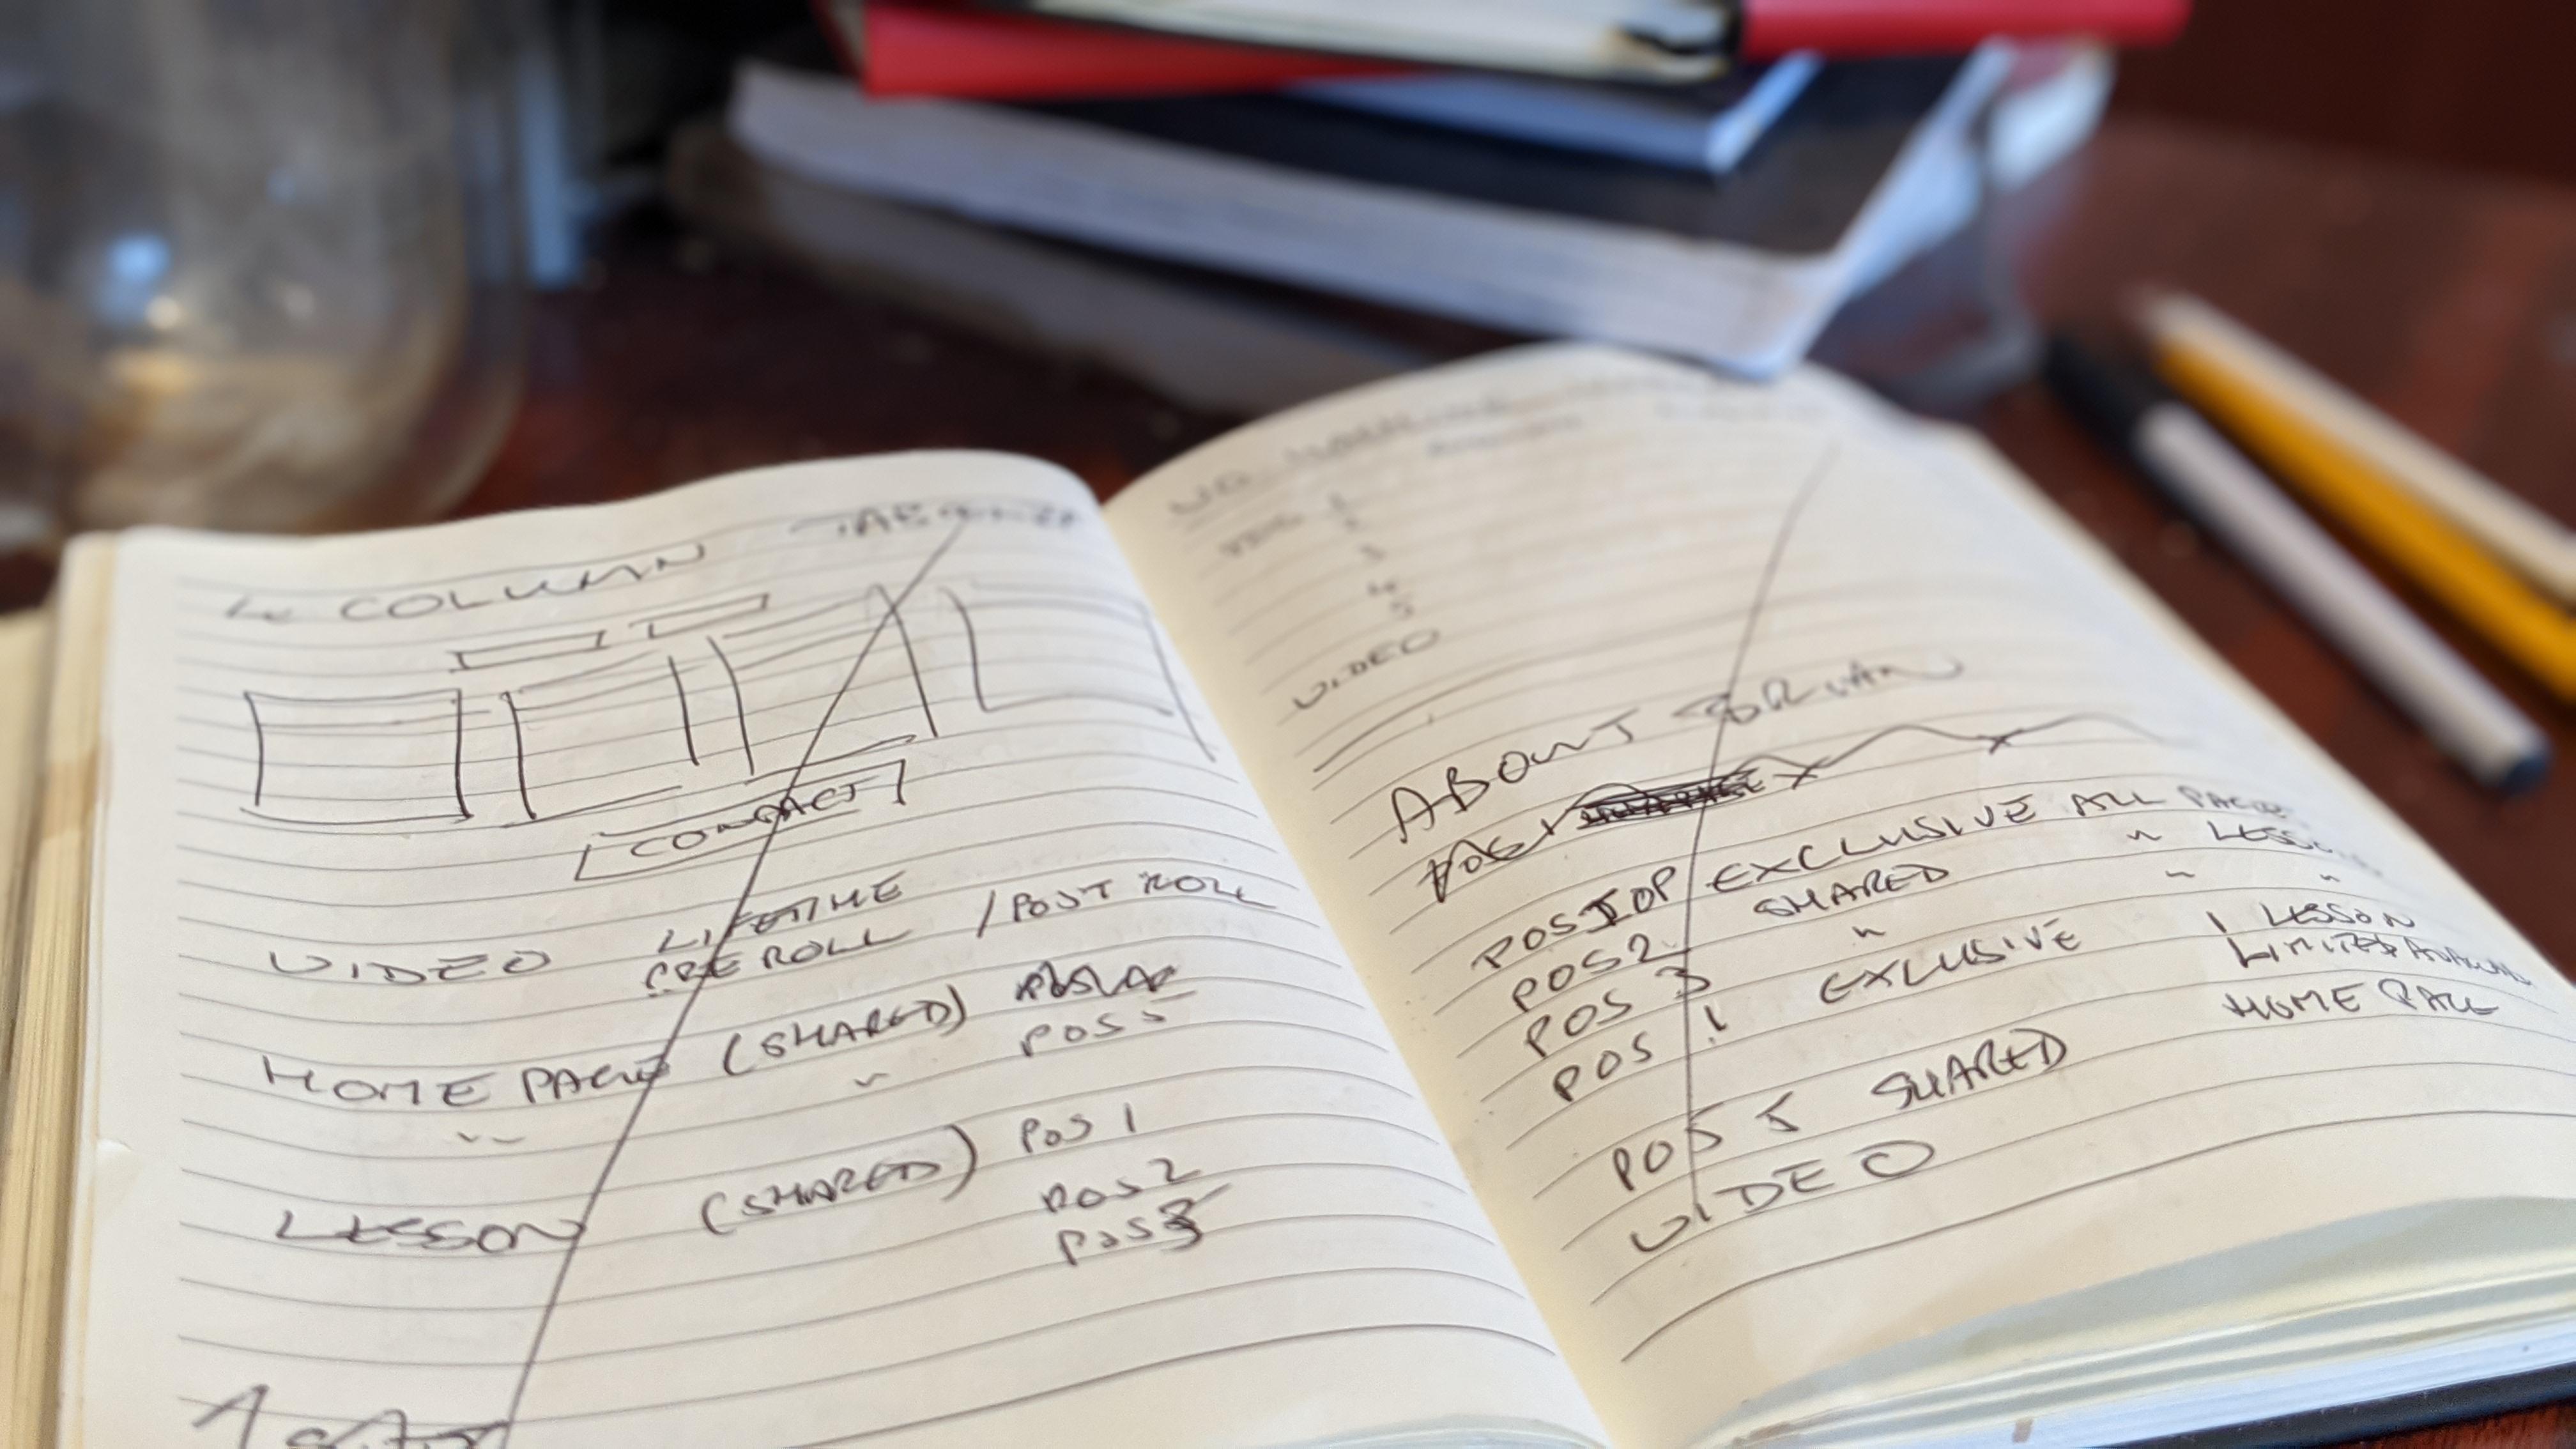 Moleskin notebook containing pencil sketches